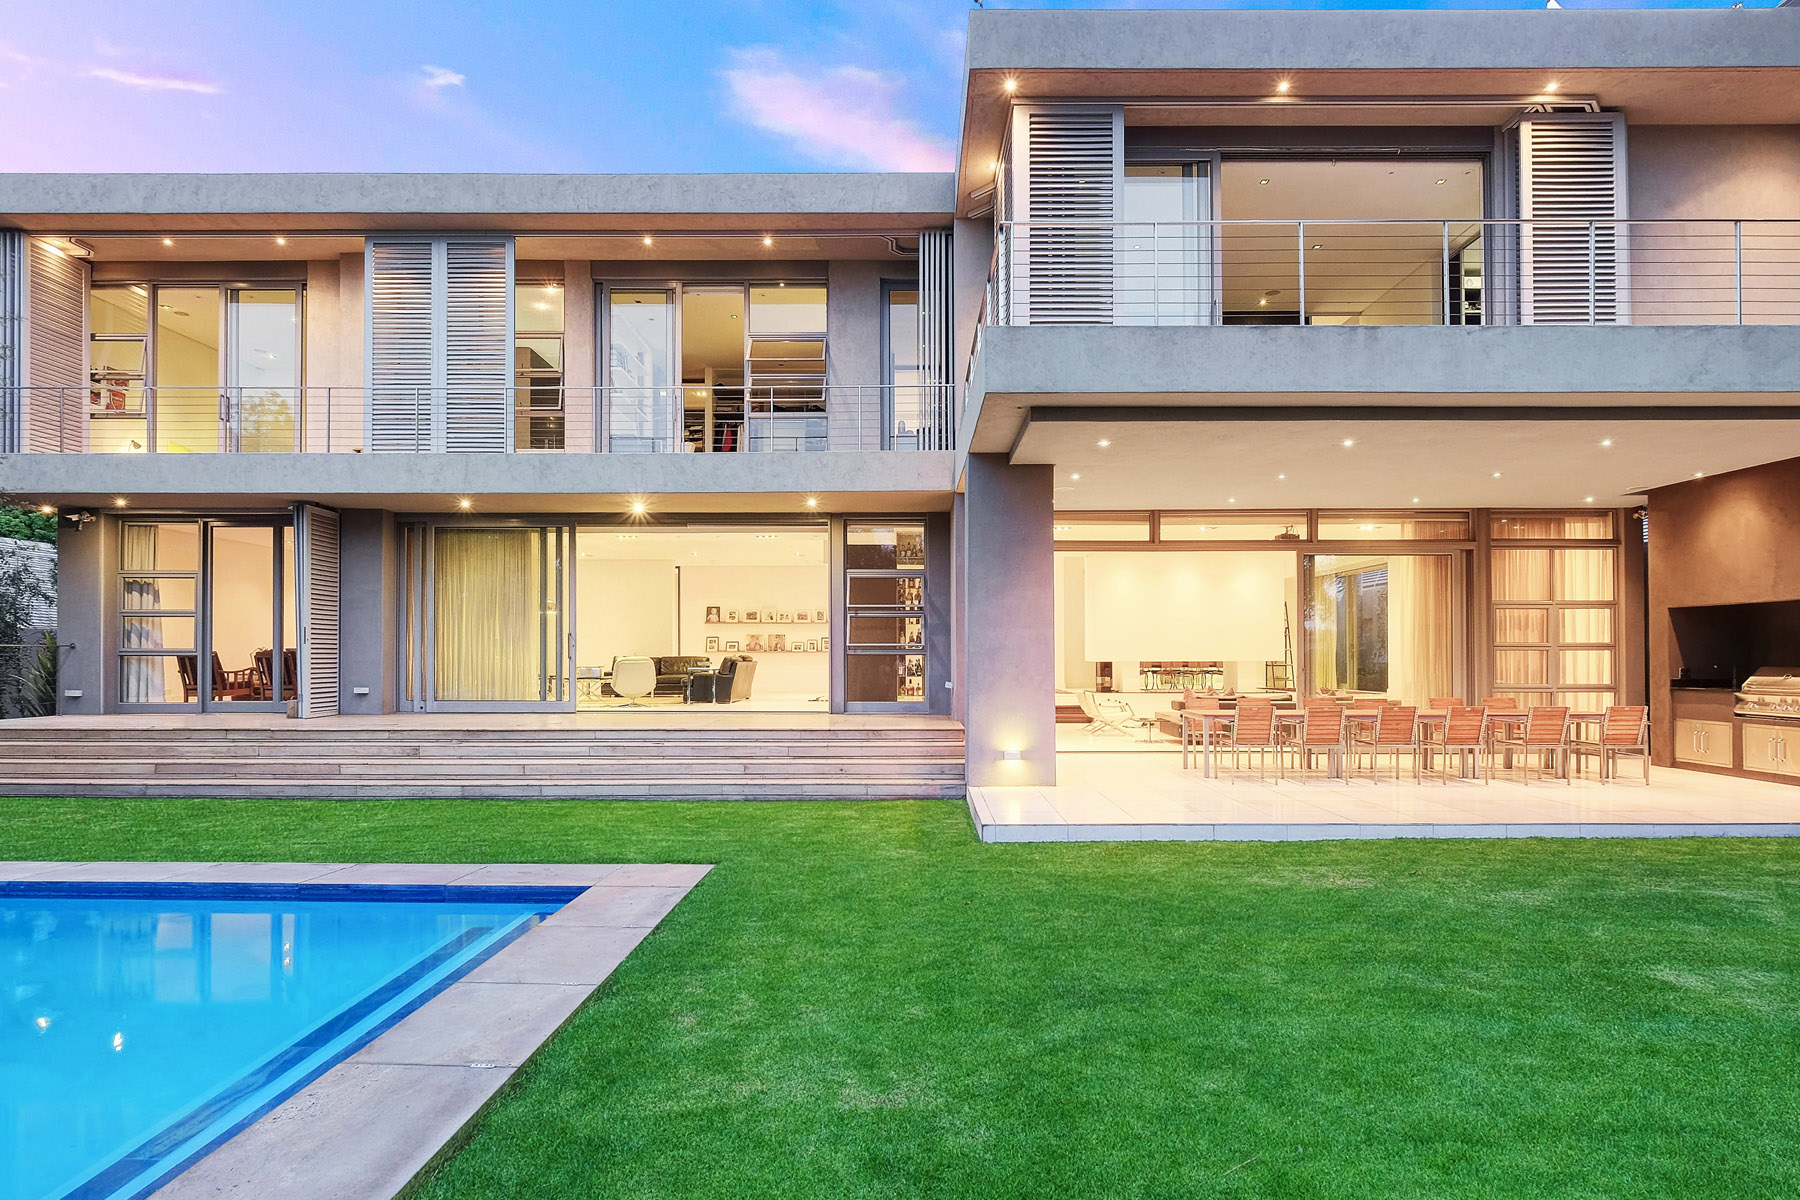 Single Family Home for Sale at Senderwood Johannesburg, Gauteng, South Africa